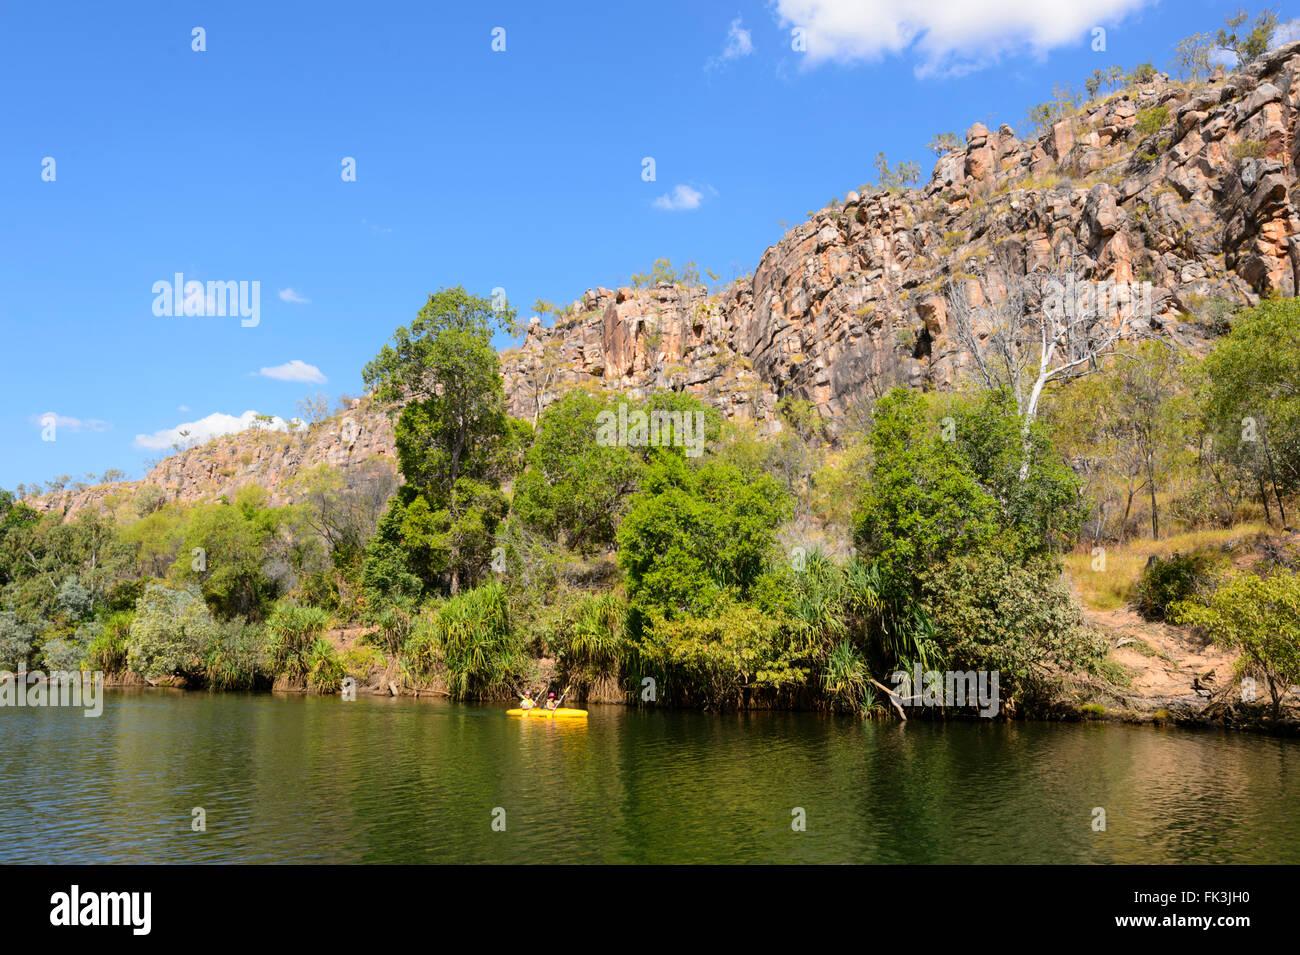 Katherine Gorge, Northern Territory, Australia - Stock Image